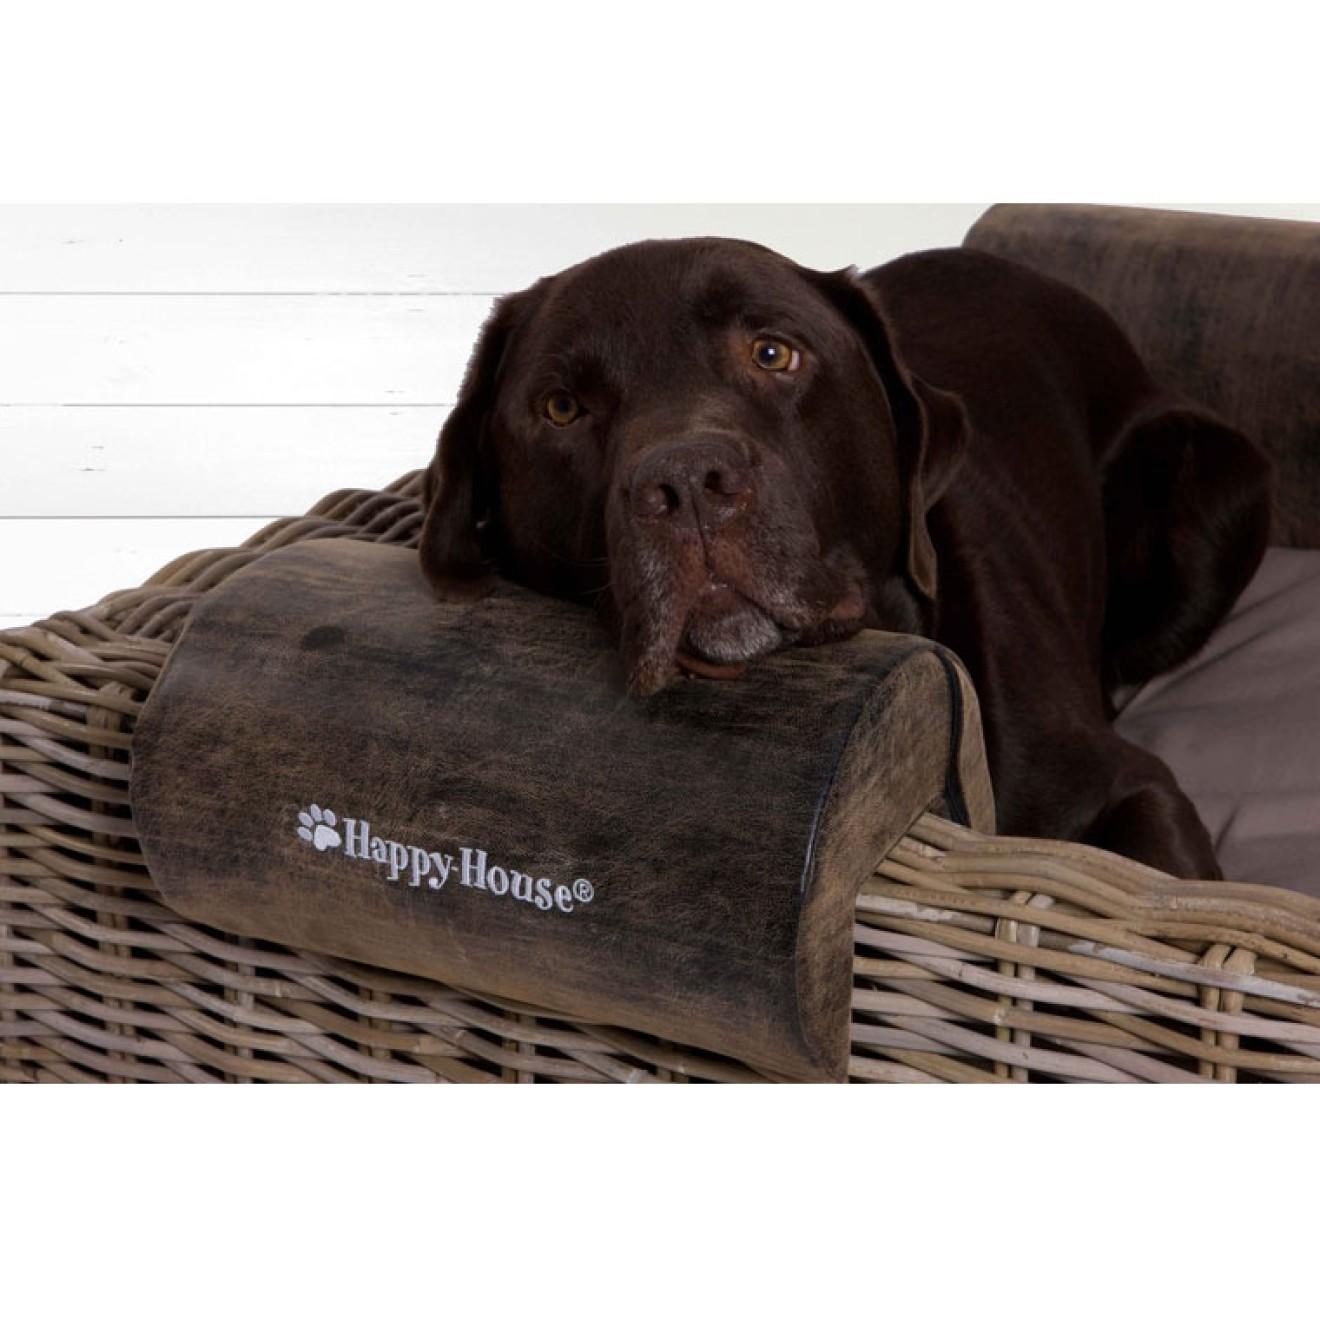 kopfkissen f r hunde rattansofa hundekopfkissen. Black Bedroom Furniture Sets. Home Design Ideas